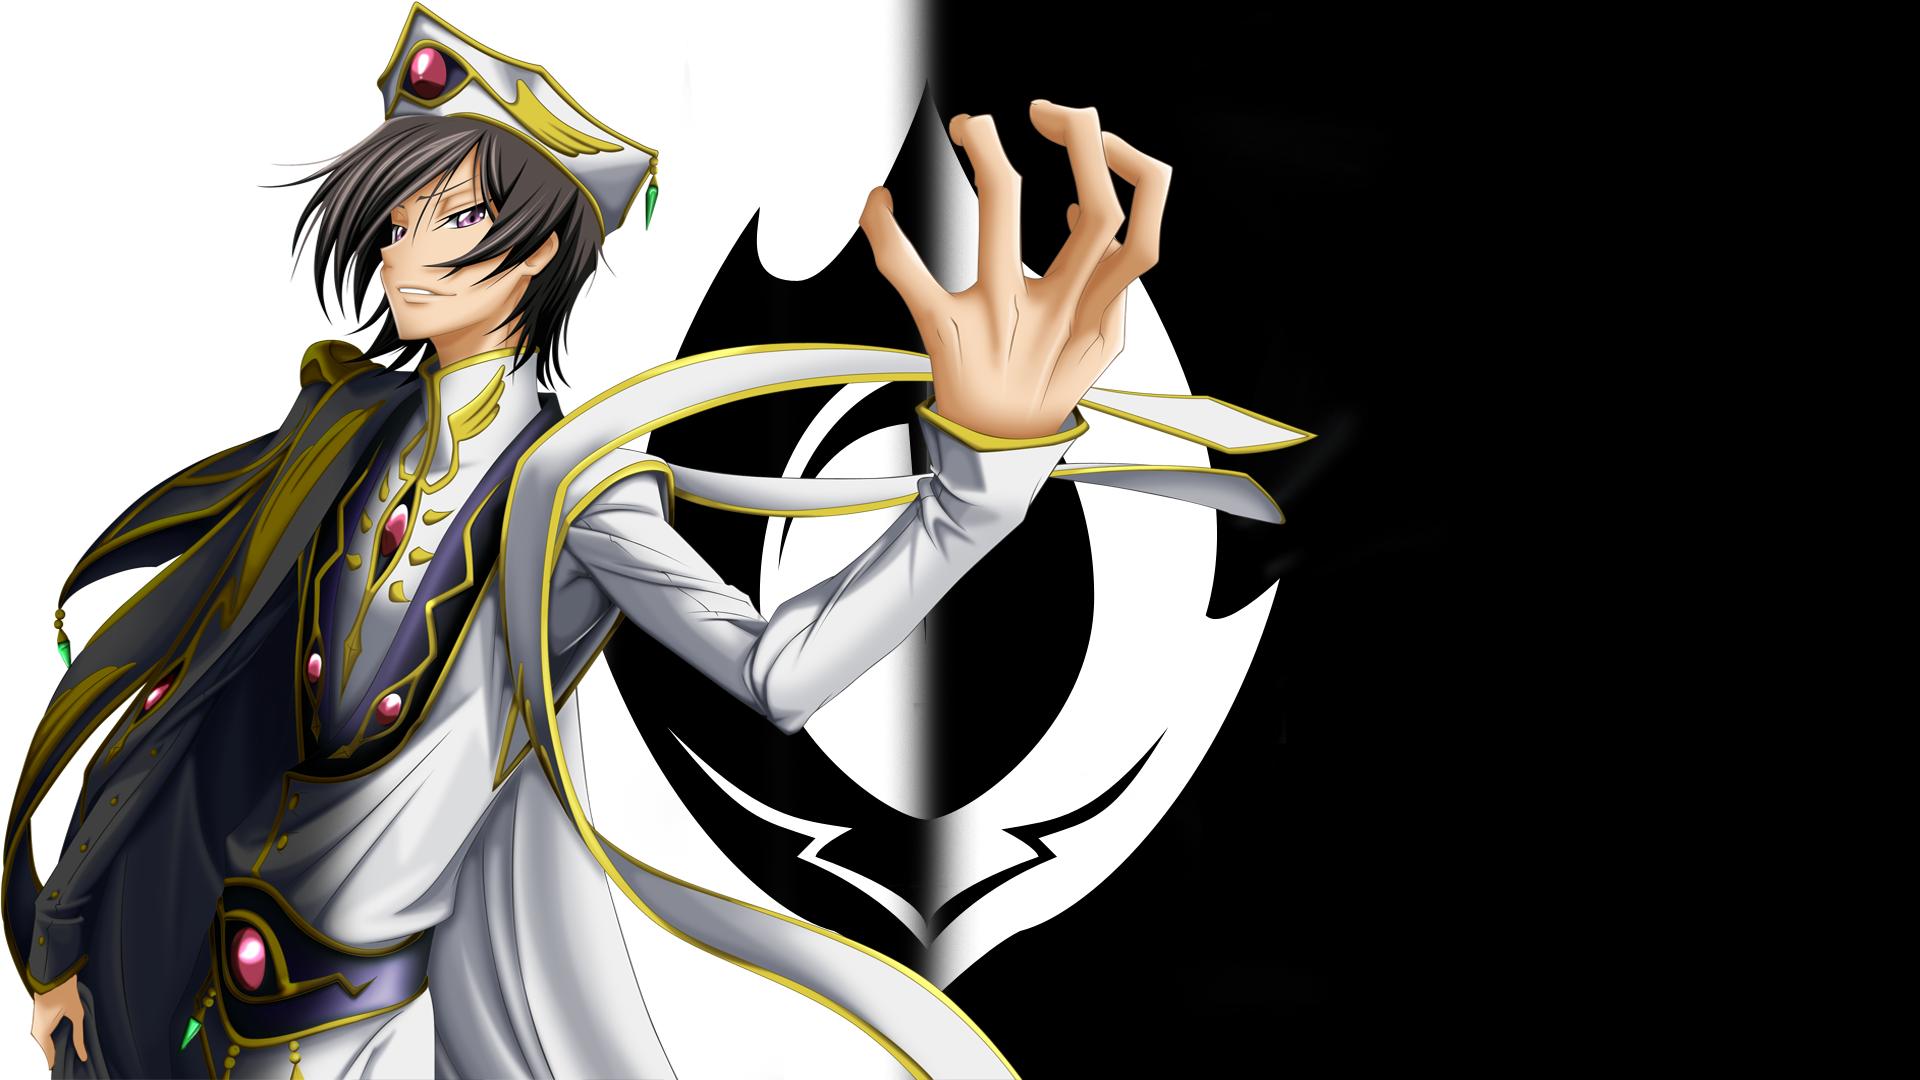 code geass lamperouge lelouch HD Wallpaper   Anime Manga 1028320 1920x1080